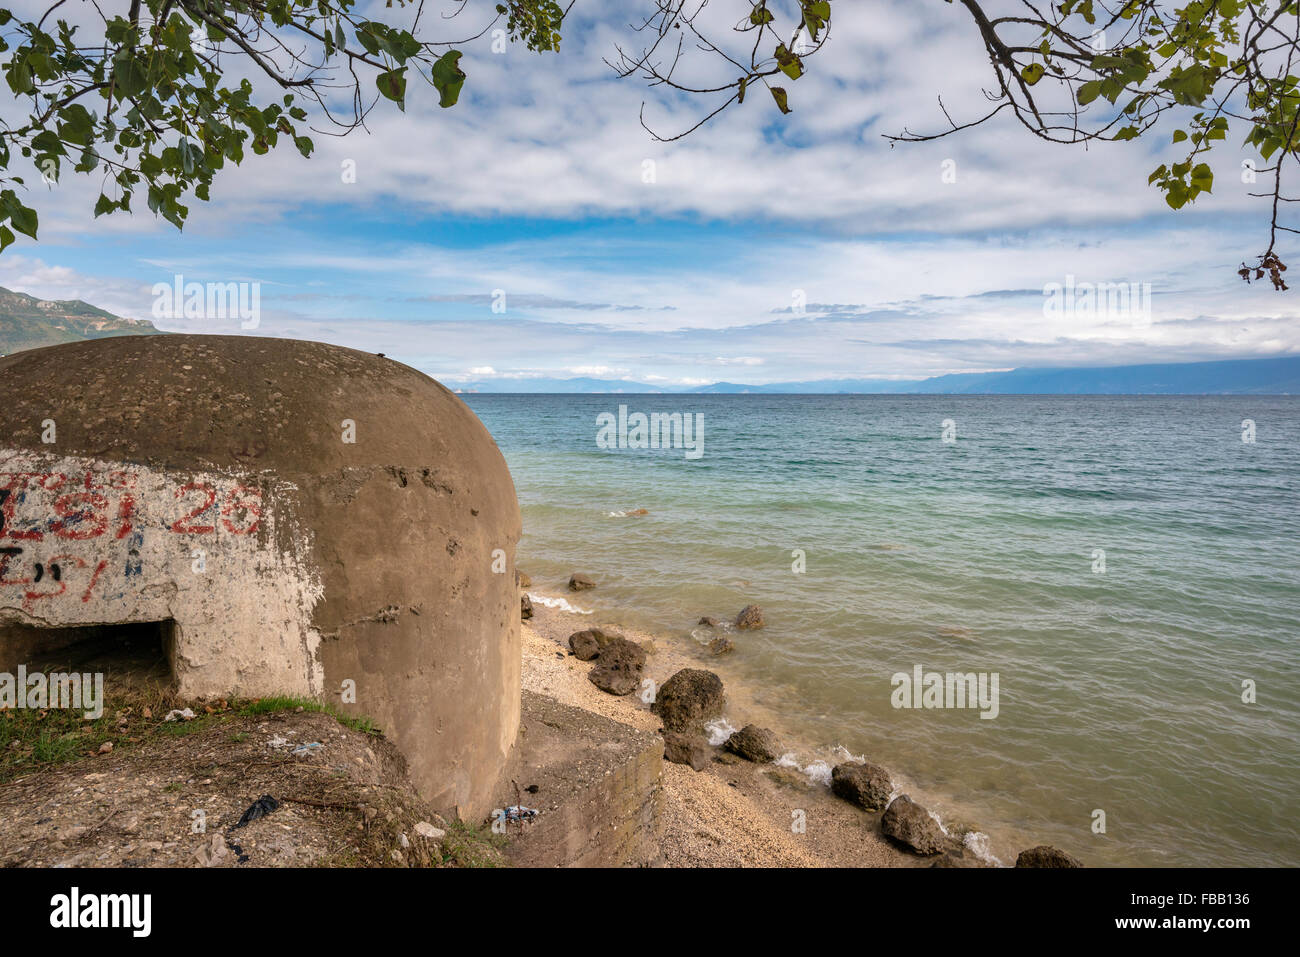 Bunker built under communist dictator Hoxha at Lake Ohrid, Macedonian shore in distance, near Pogradec, Albania - Stock Image